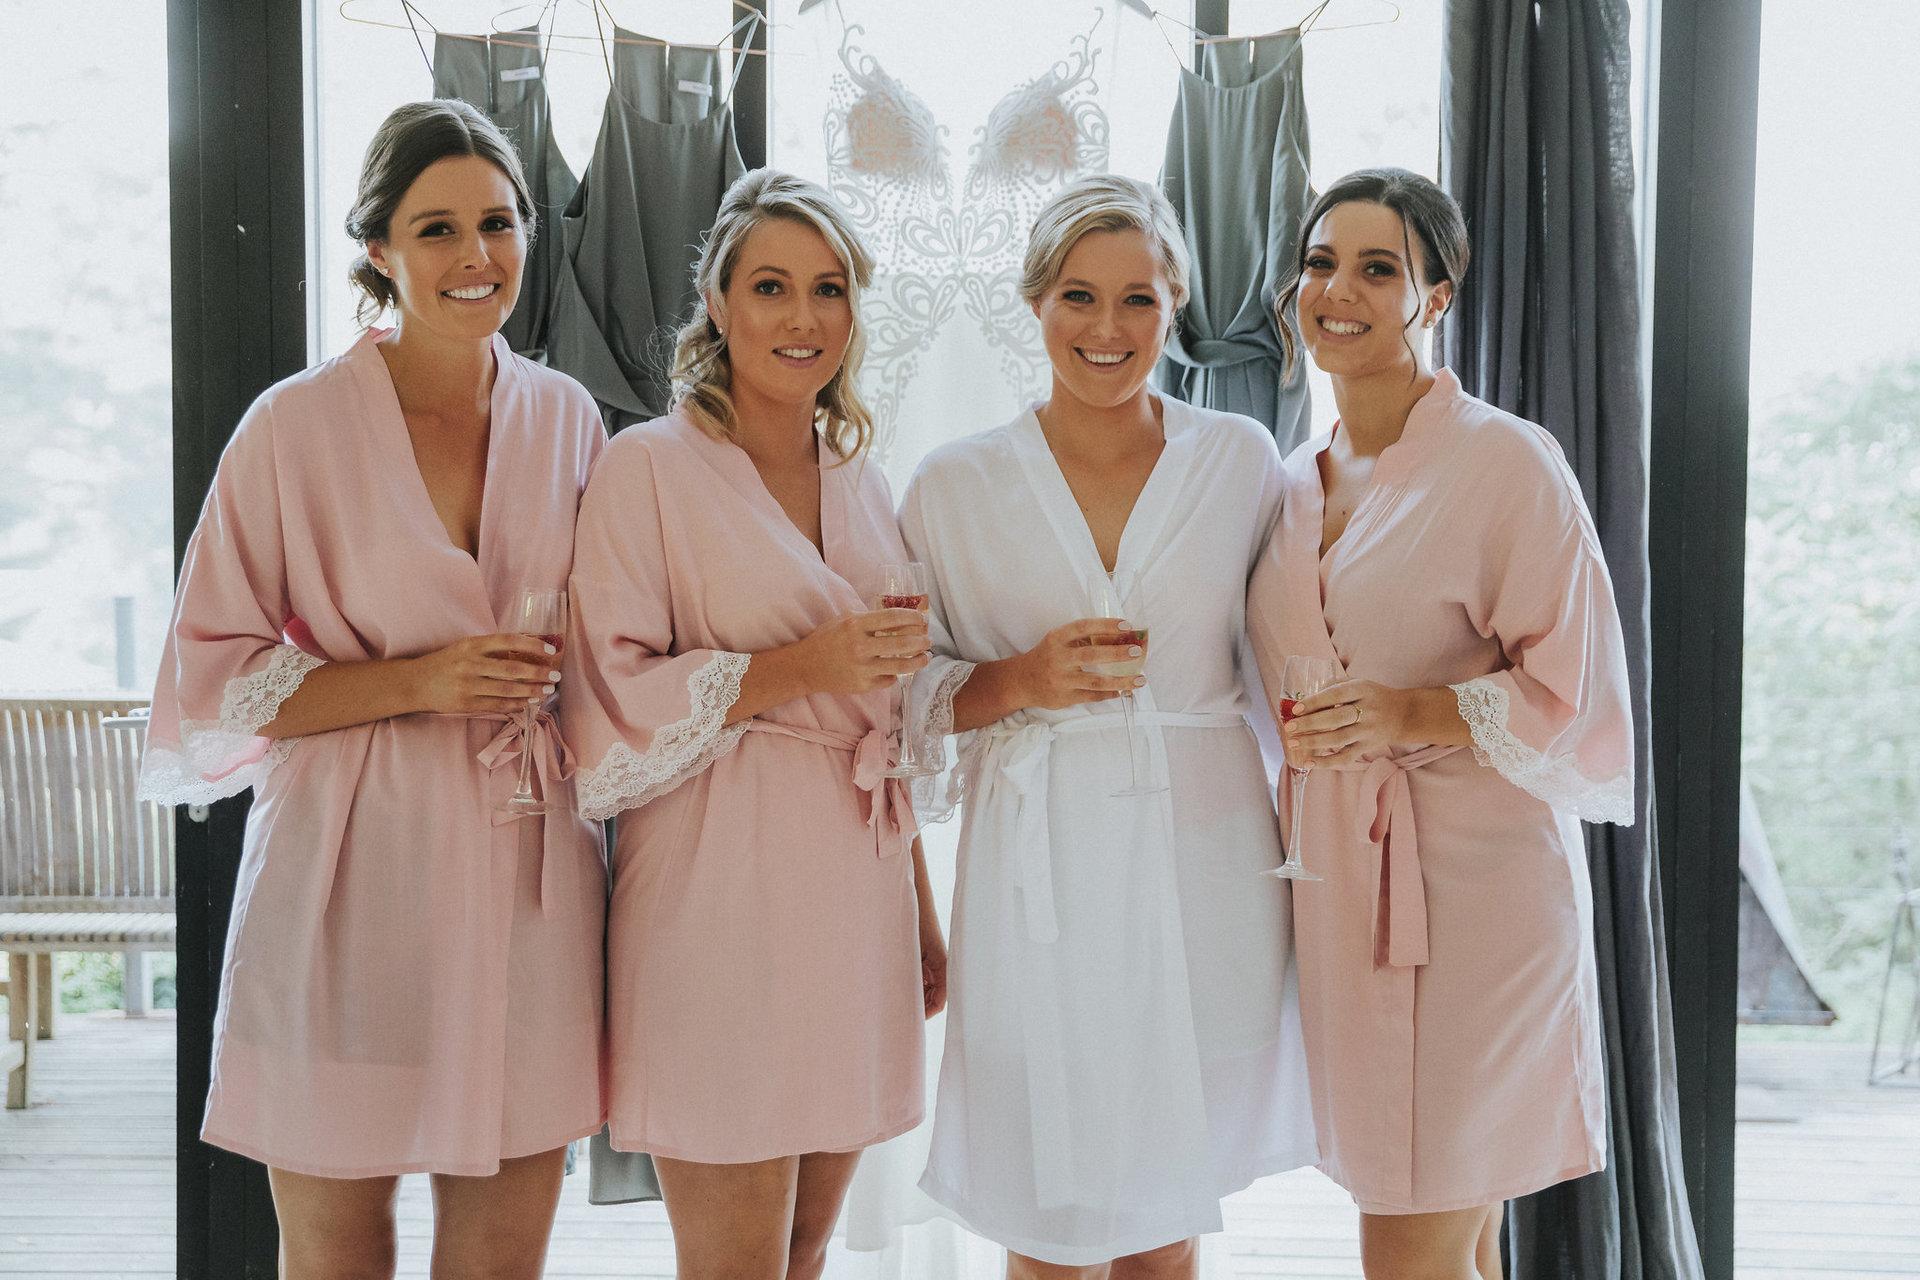 Natasha's bridesmaids